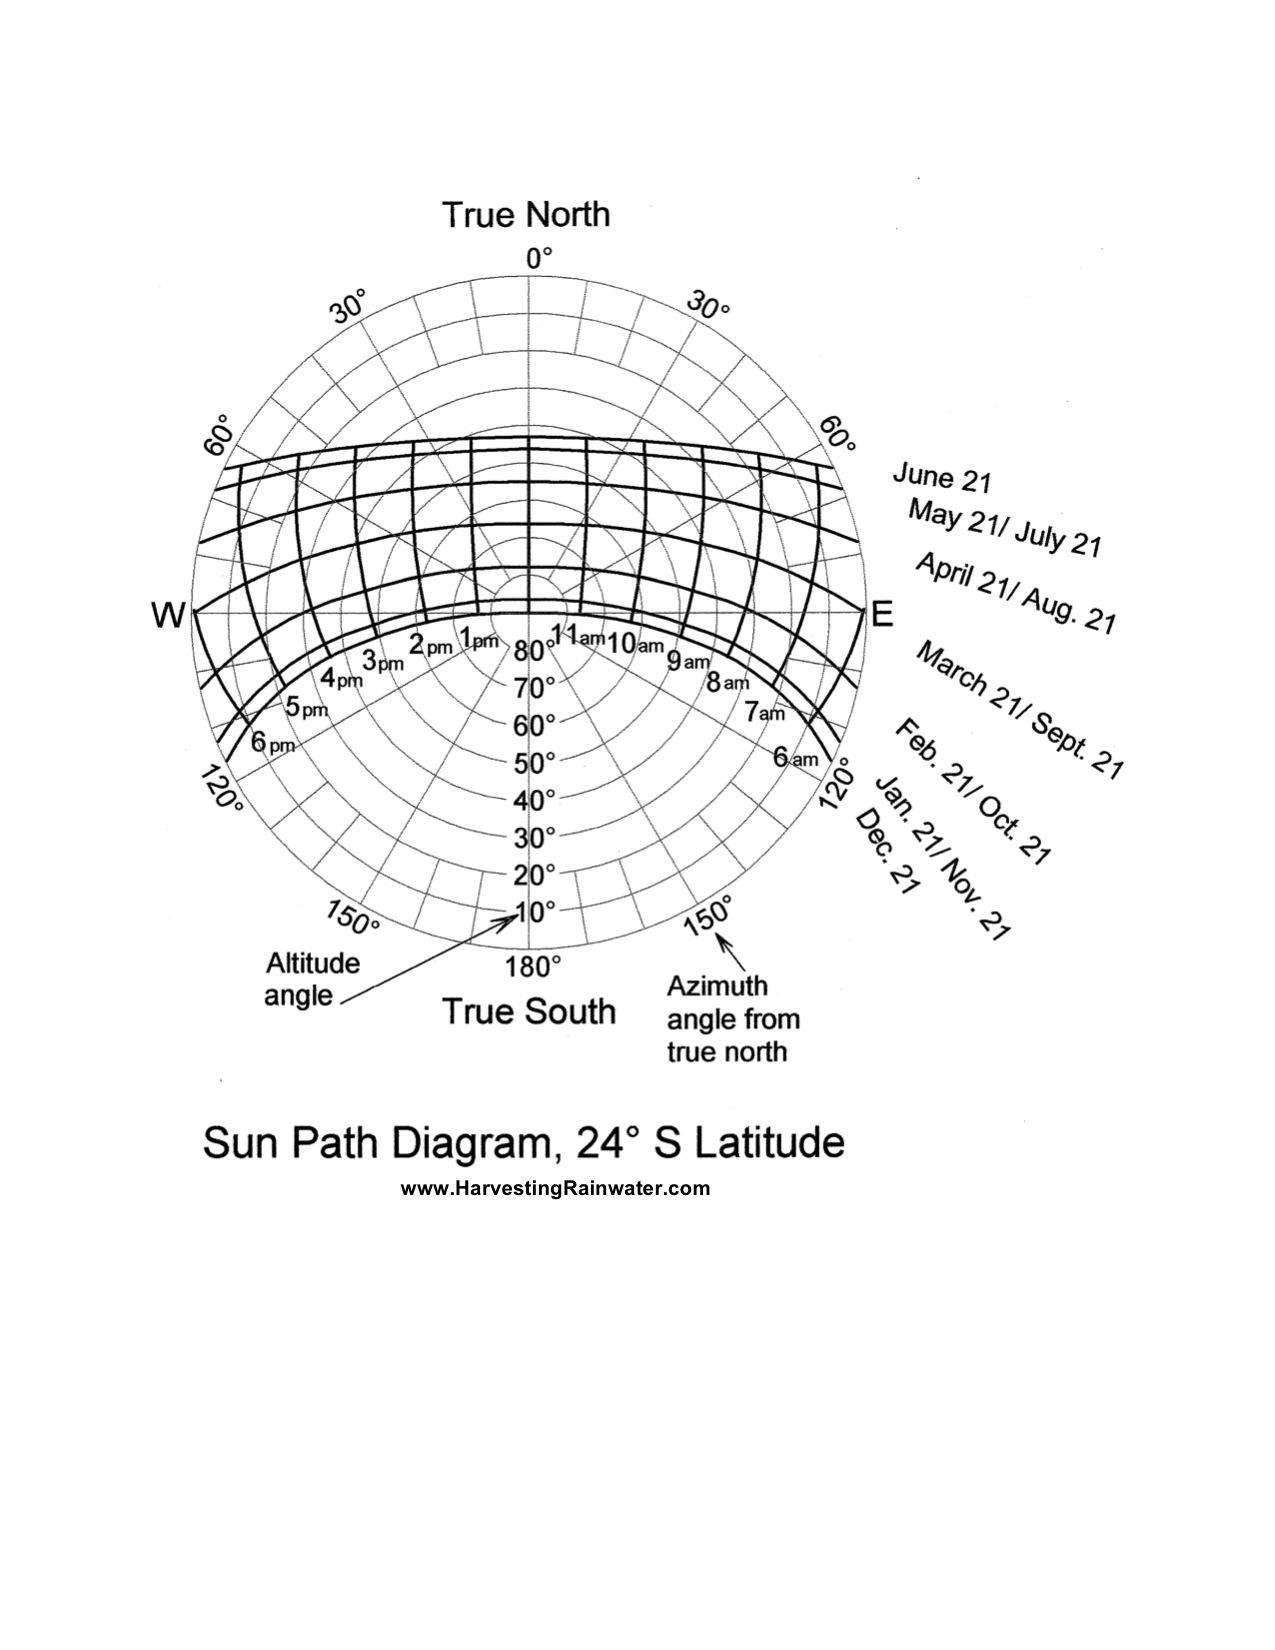 Sun Path Diagram 24o S Latitude